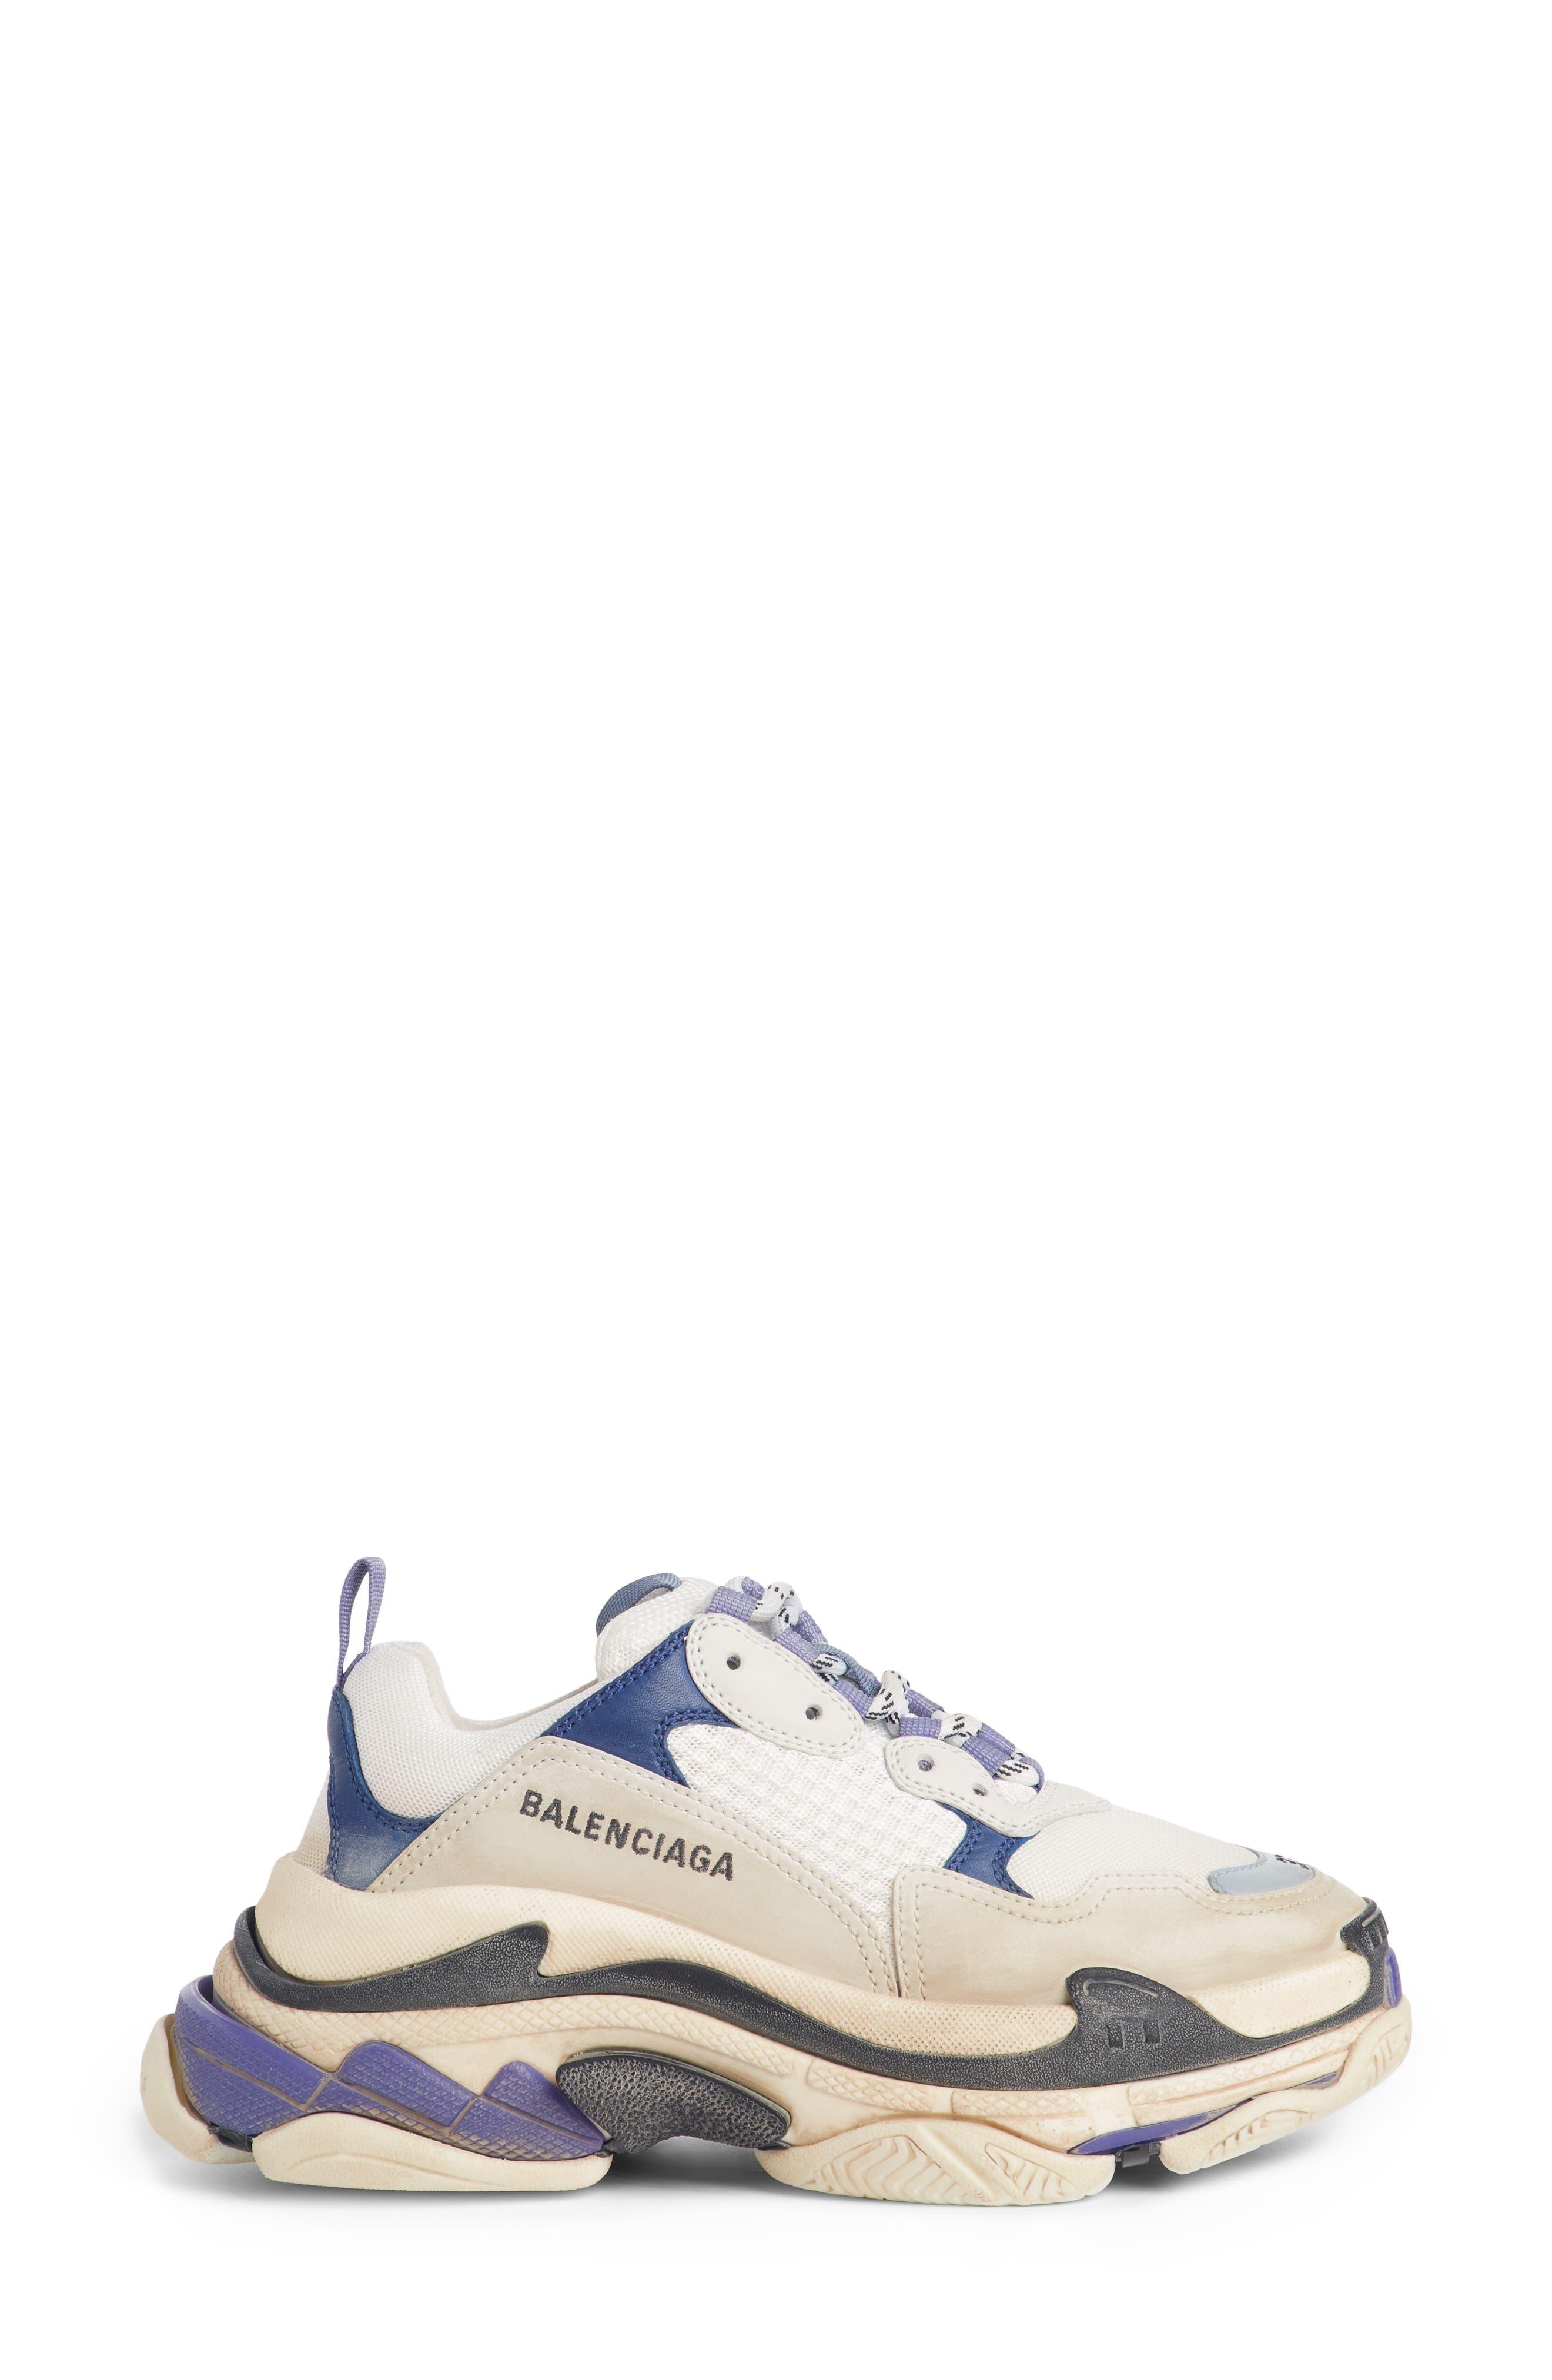 BALENCIAGA, Triple S Sneaker, Alternate thumbnail 3, color, VIOLET/ WHITE/ BLUE